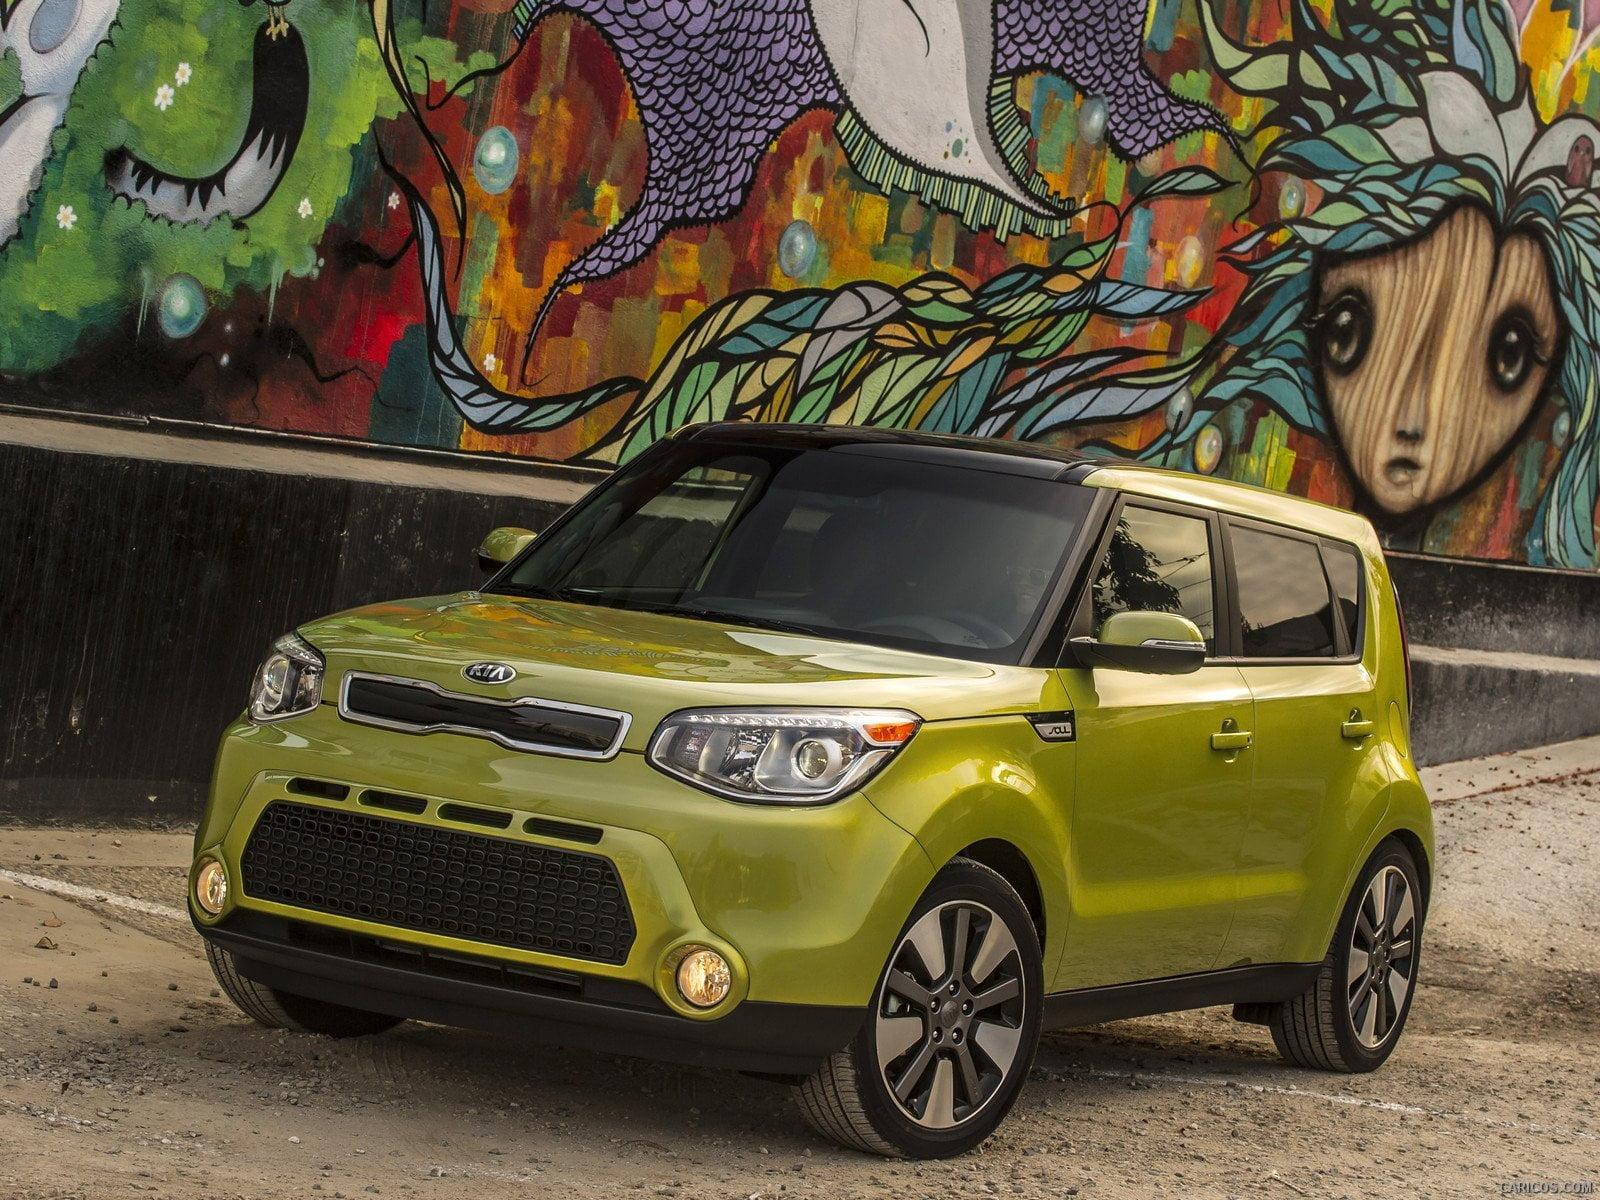 Czech Republic new vehicles sales